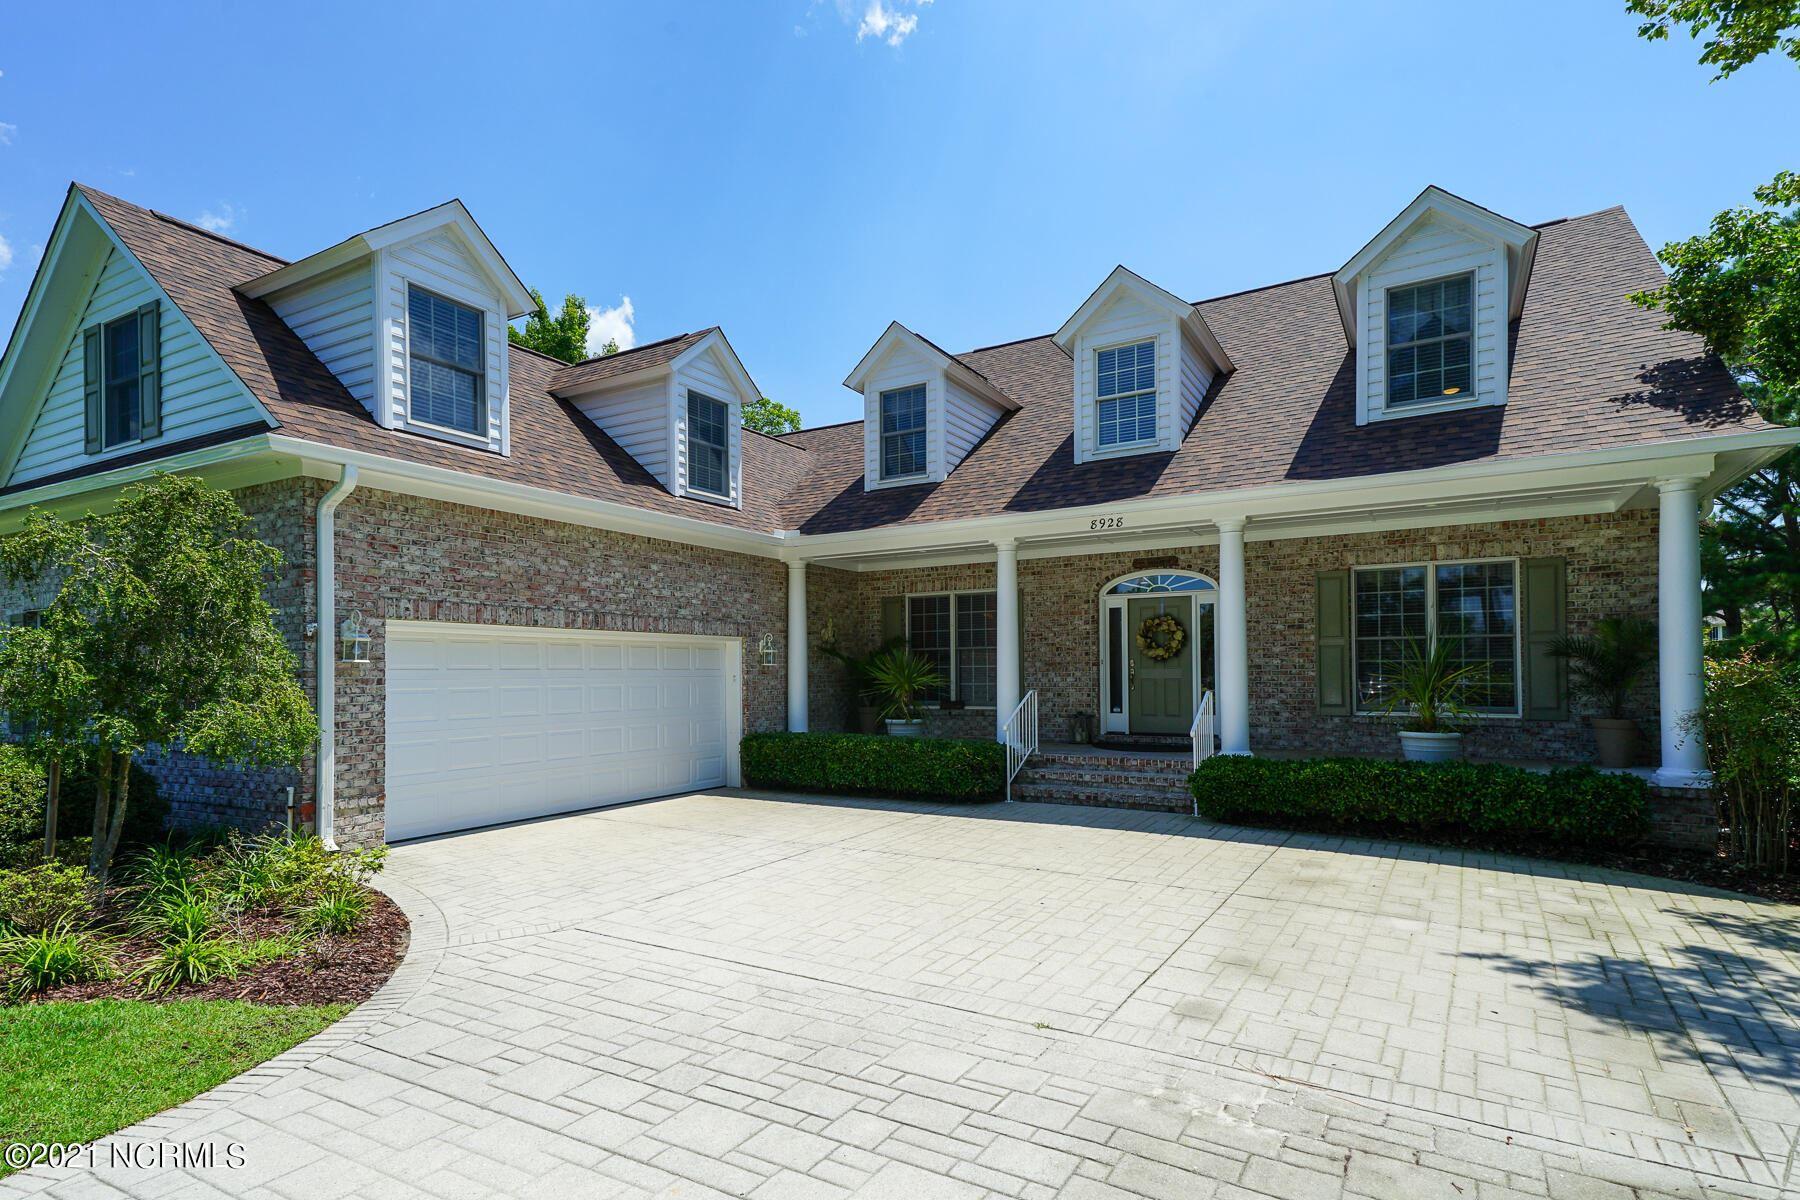 Photo of 8928 Woodcreek Circle, Wilmington, NC 28411 (MLS # 100276964)